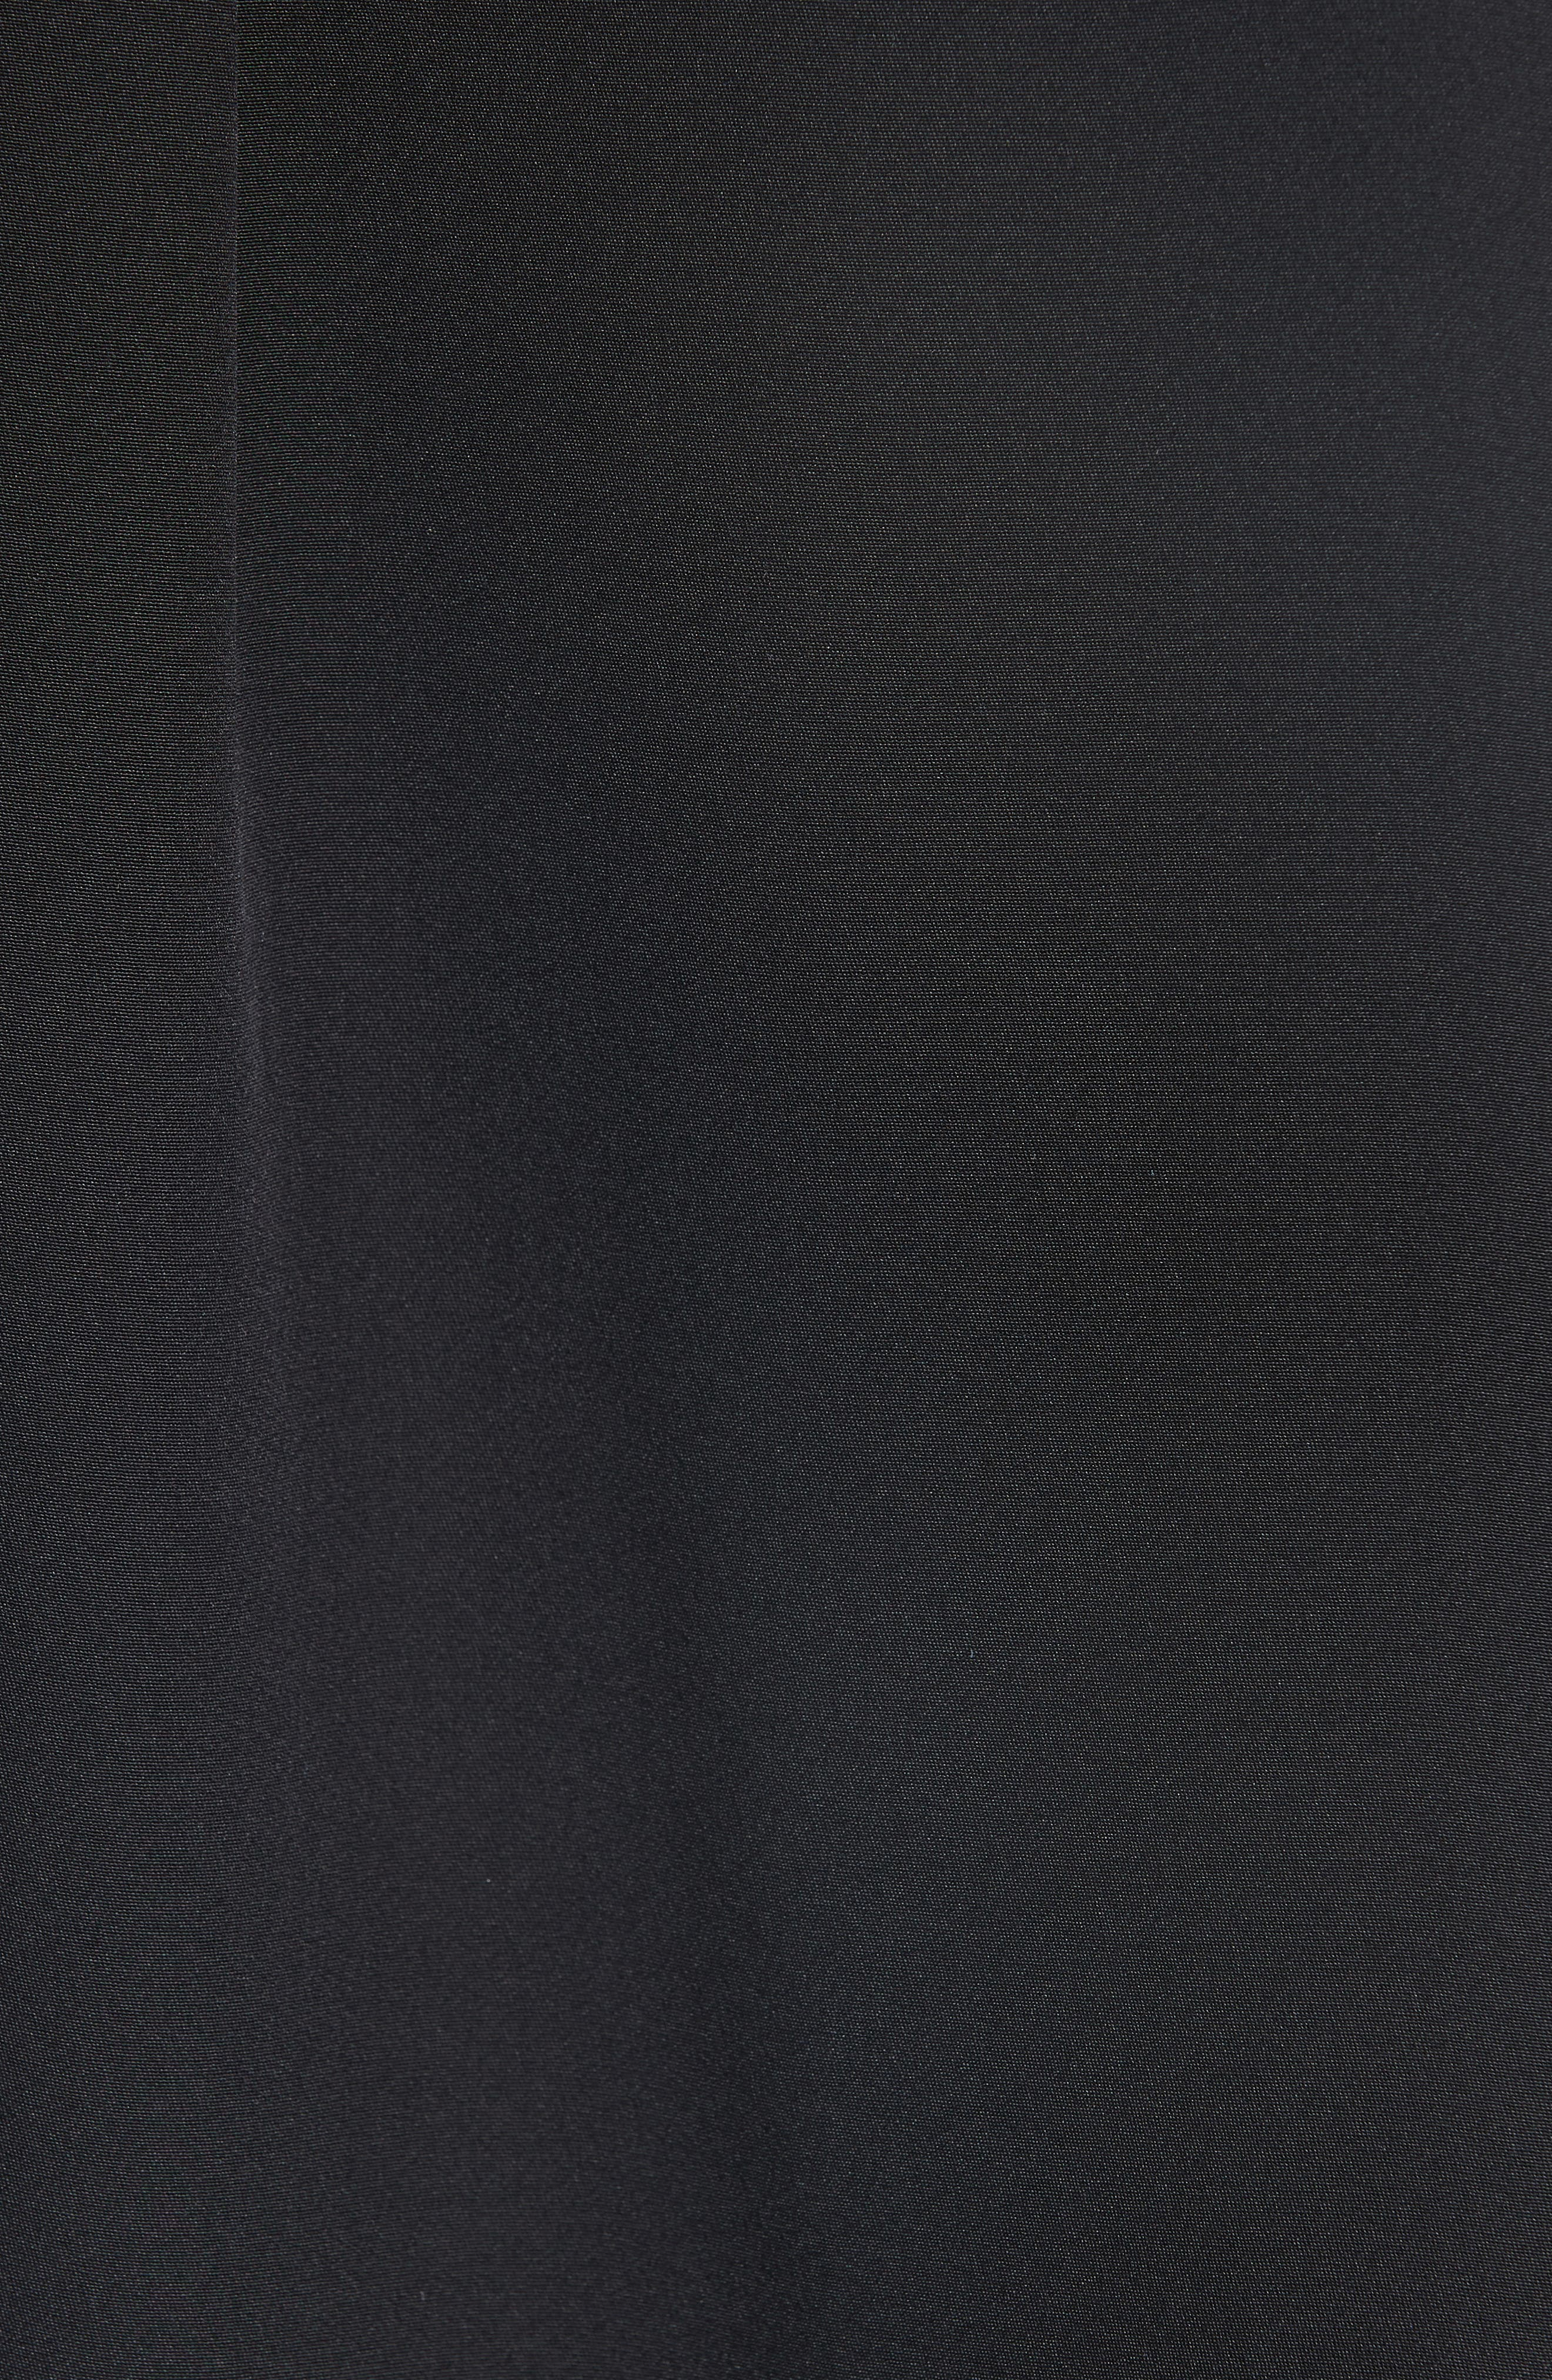 Satin Tie Neck Silk Blouse,                             Alternate thumbnail 6, color,                             BLACK